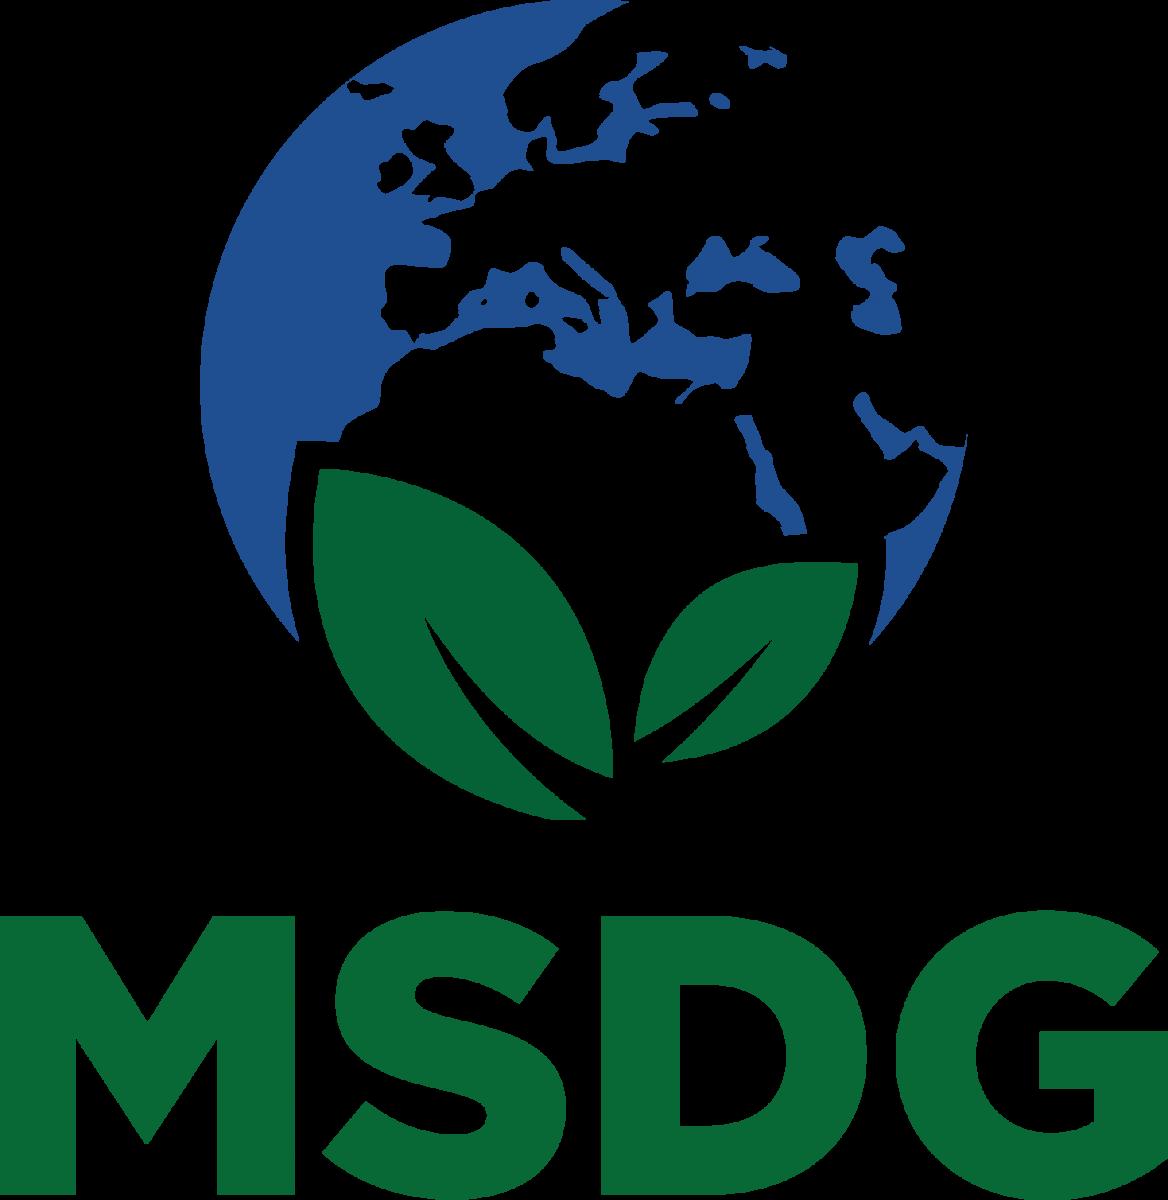 Management of Sustainable Development Goals